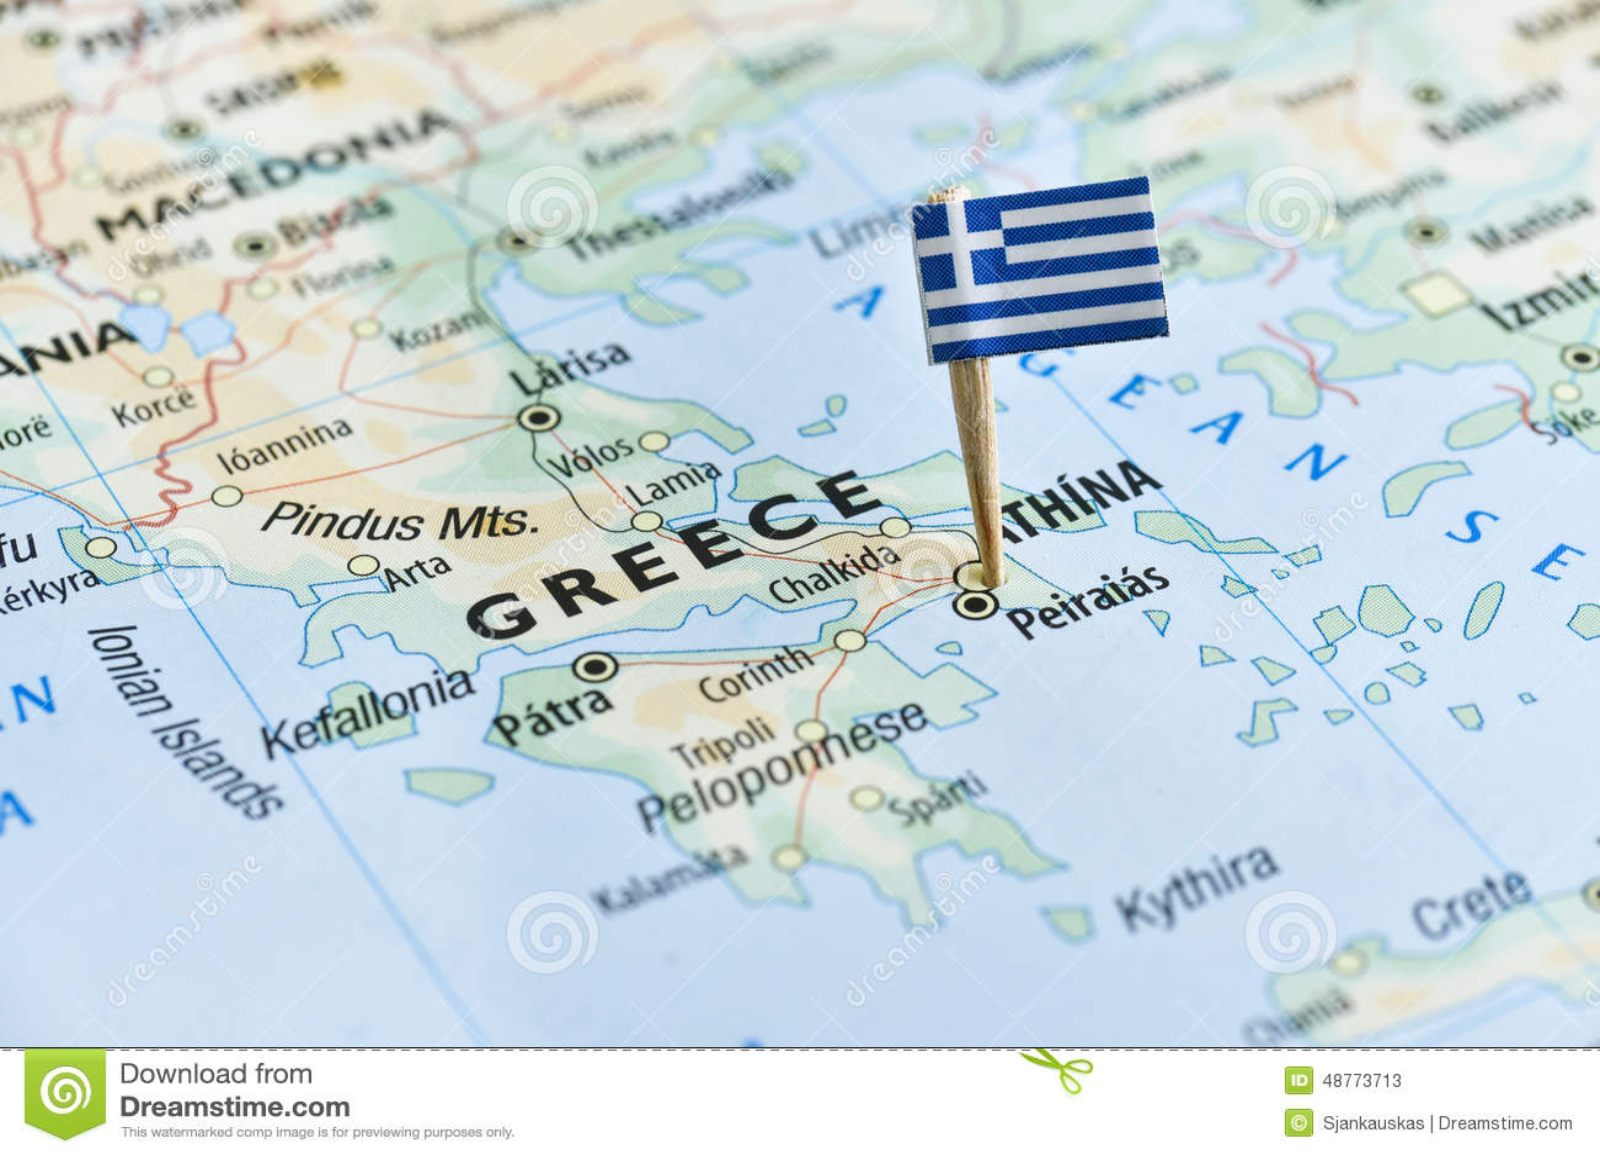 Greece Flag Pin On Map Stock Image Image Of Season Geographical